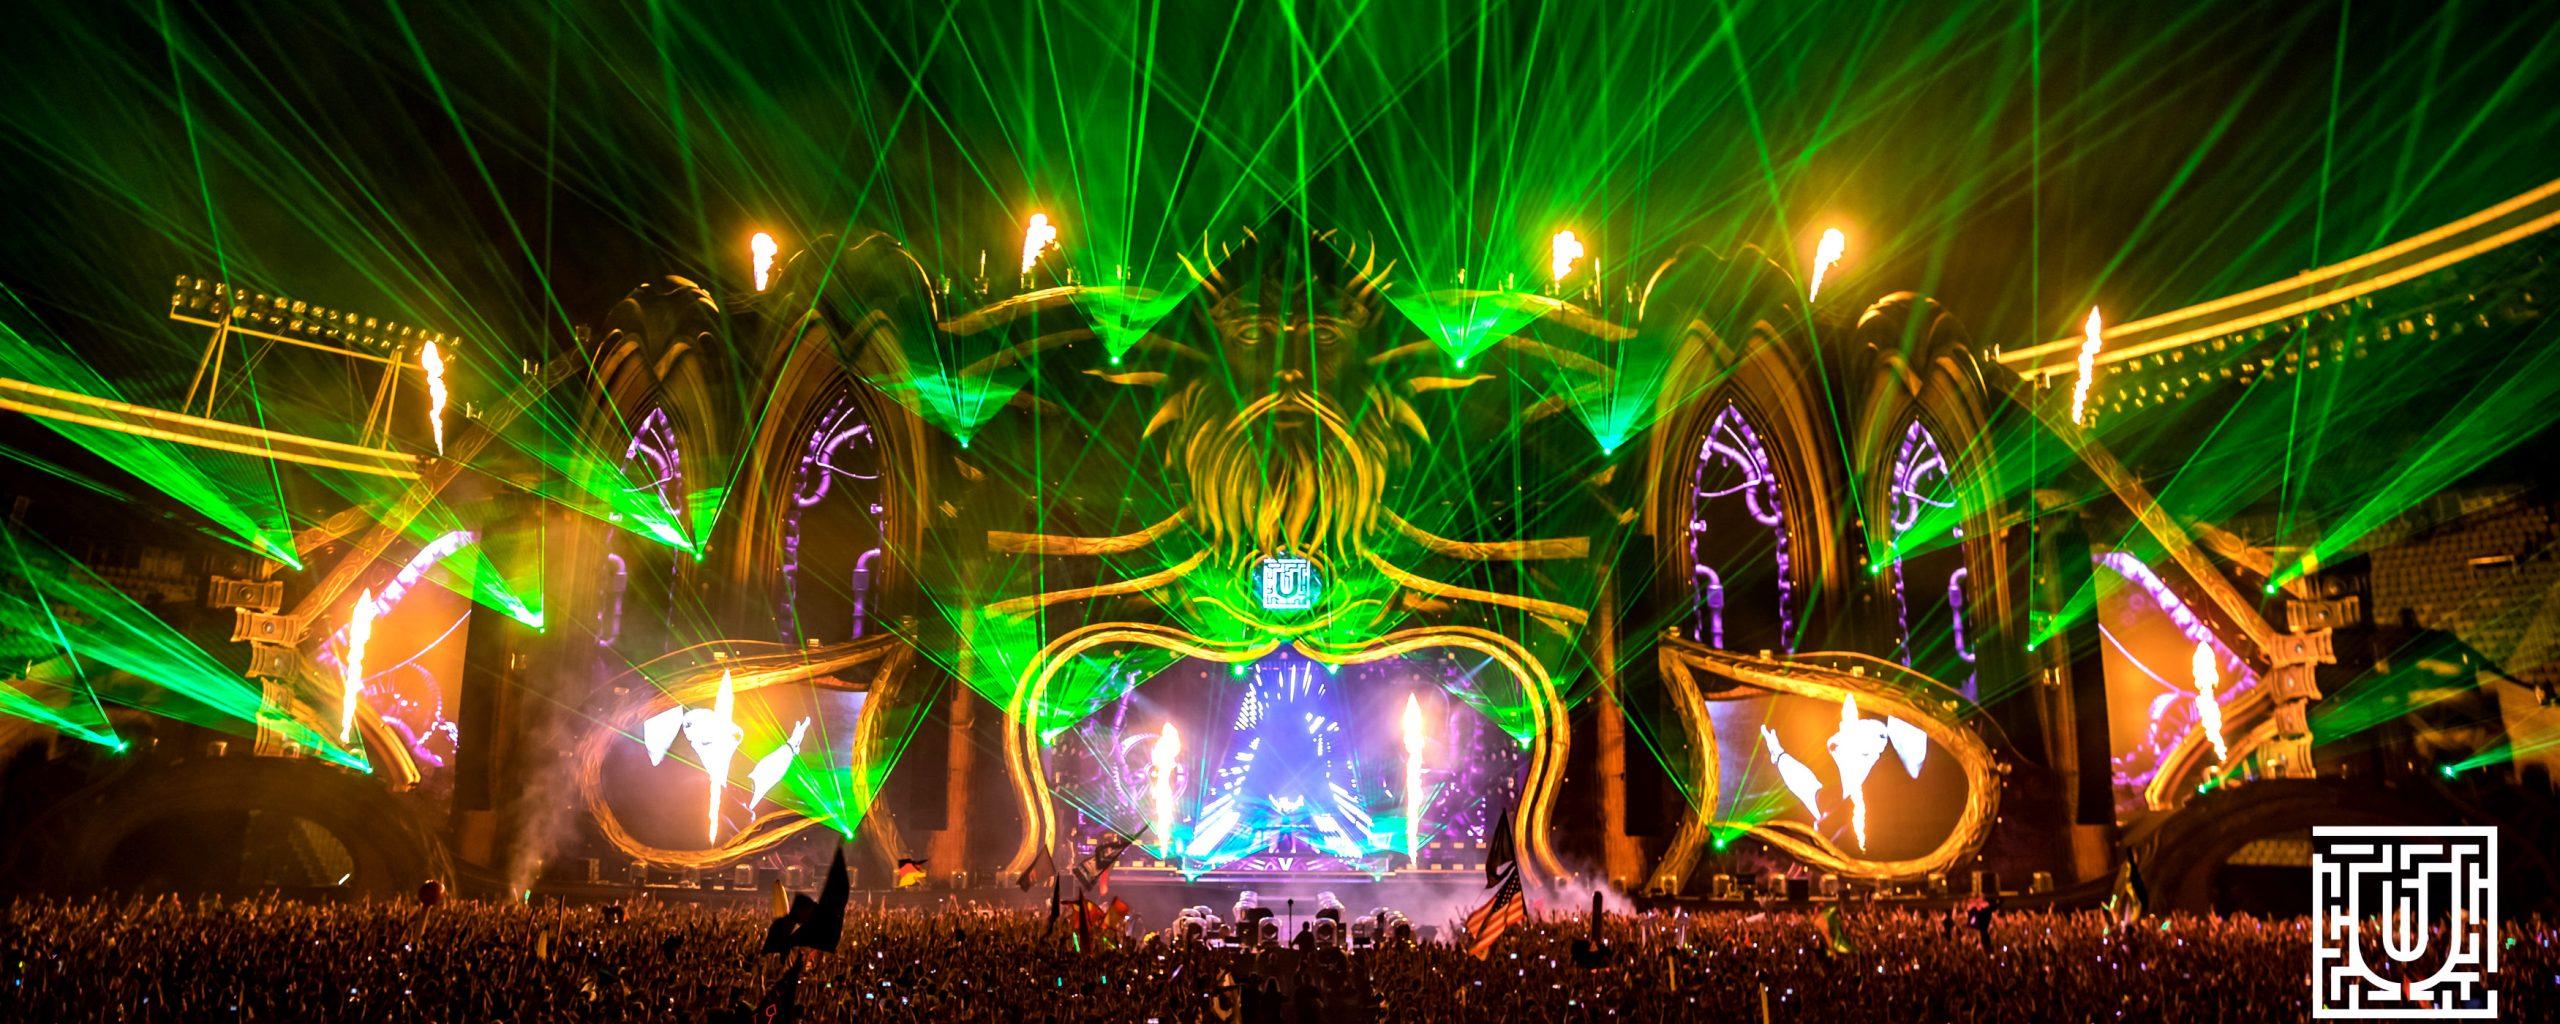 Untold festival 2020 тур из Украины